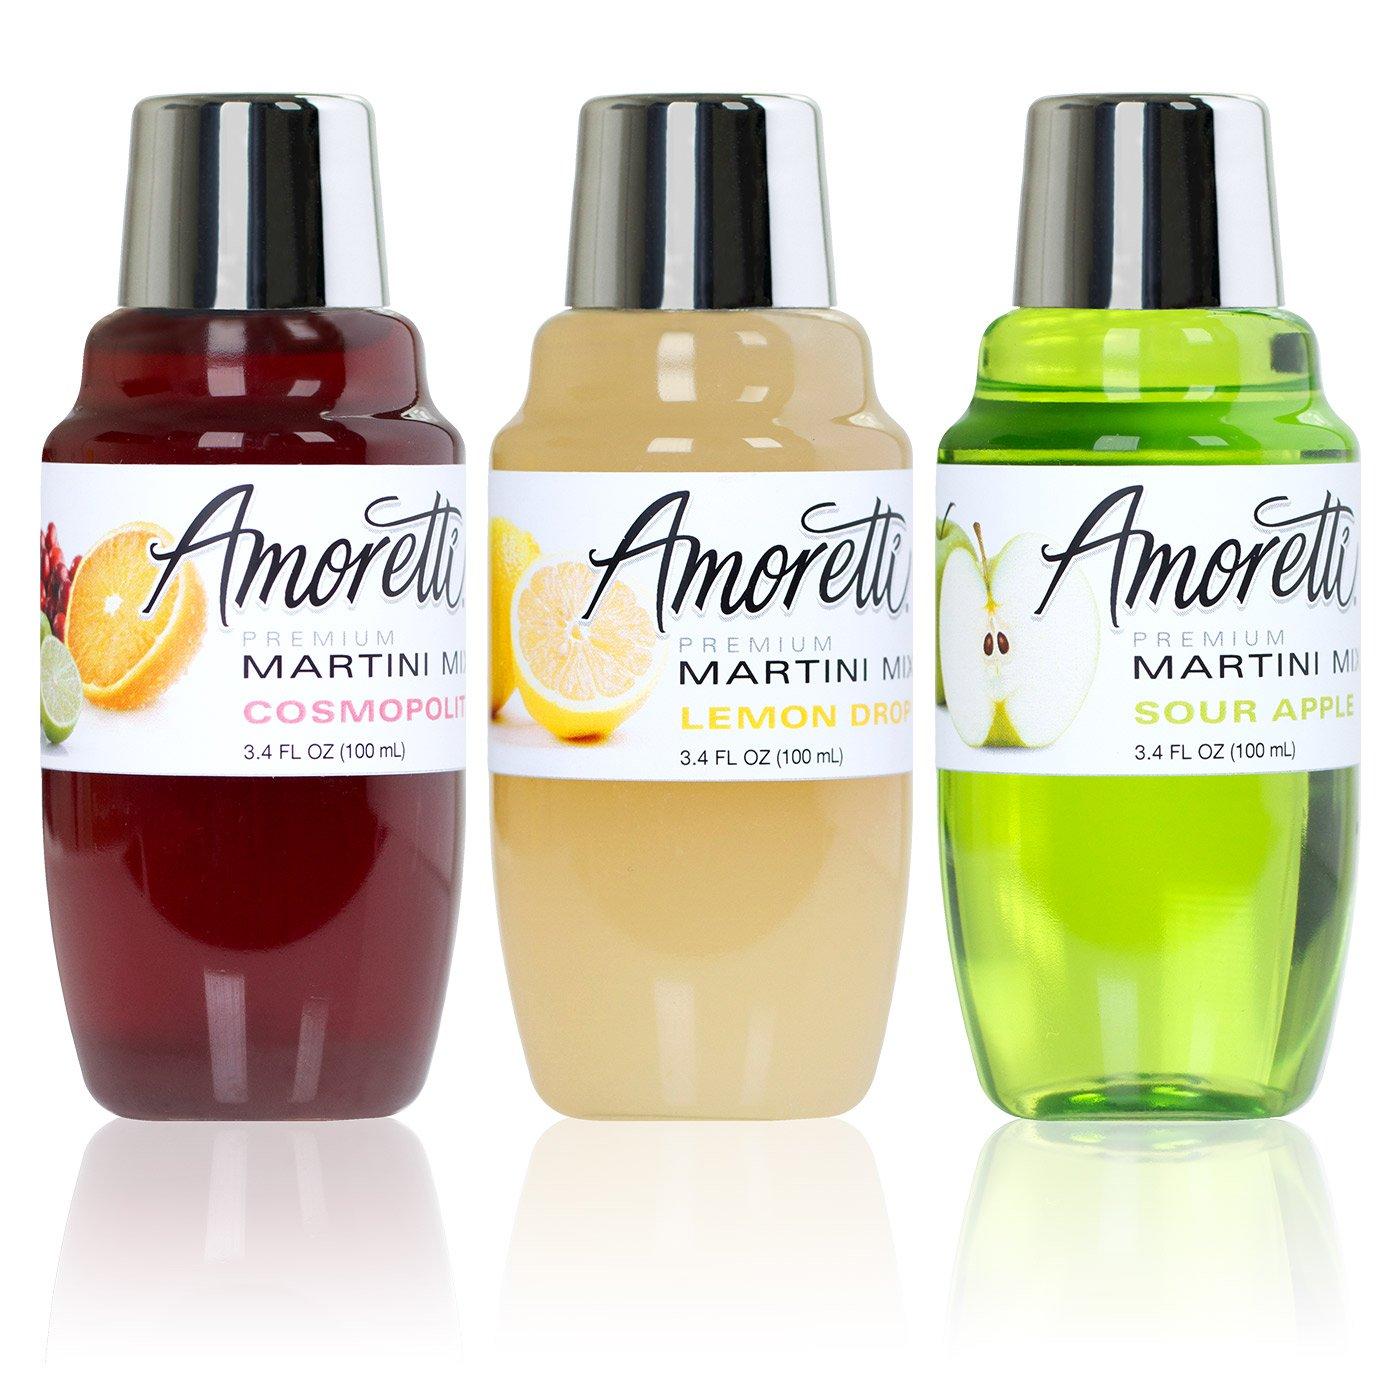 Amoretti Premium Martini Cocktail Mix Classic Minis, 3.4 fl oz, 3-Count (Cosmopolitan, Lemon Drop and Sour Apple) by Amoretti